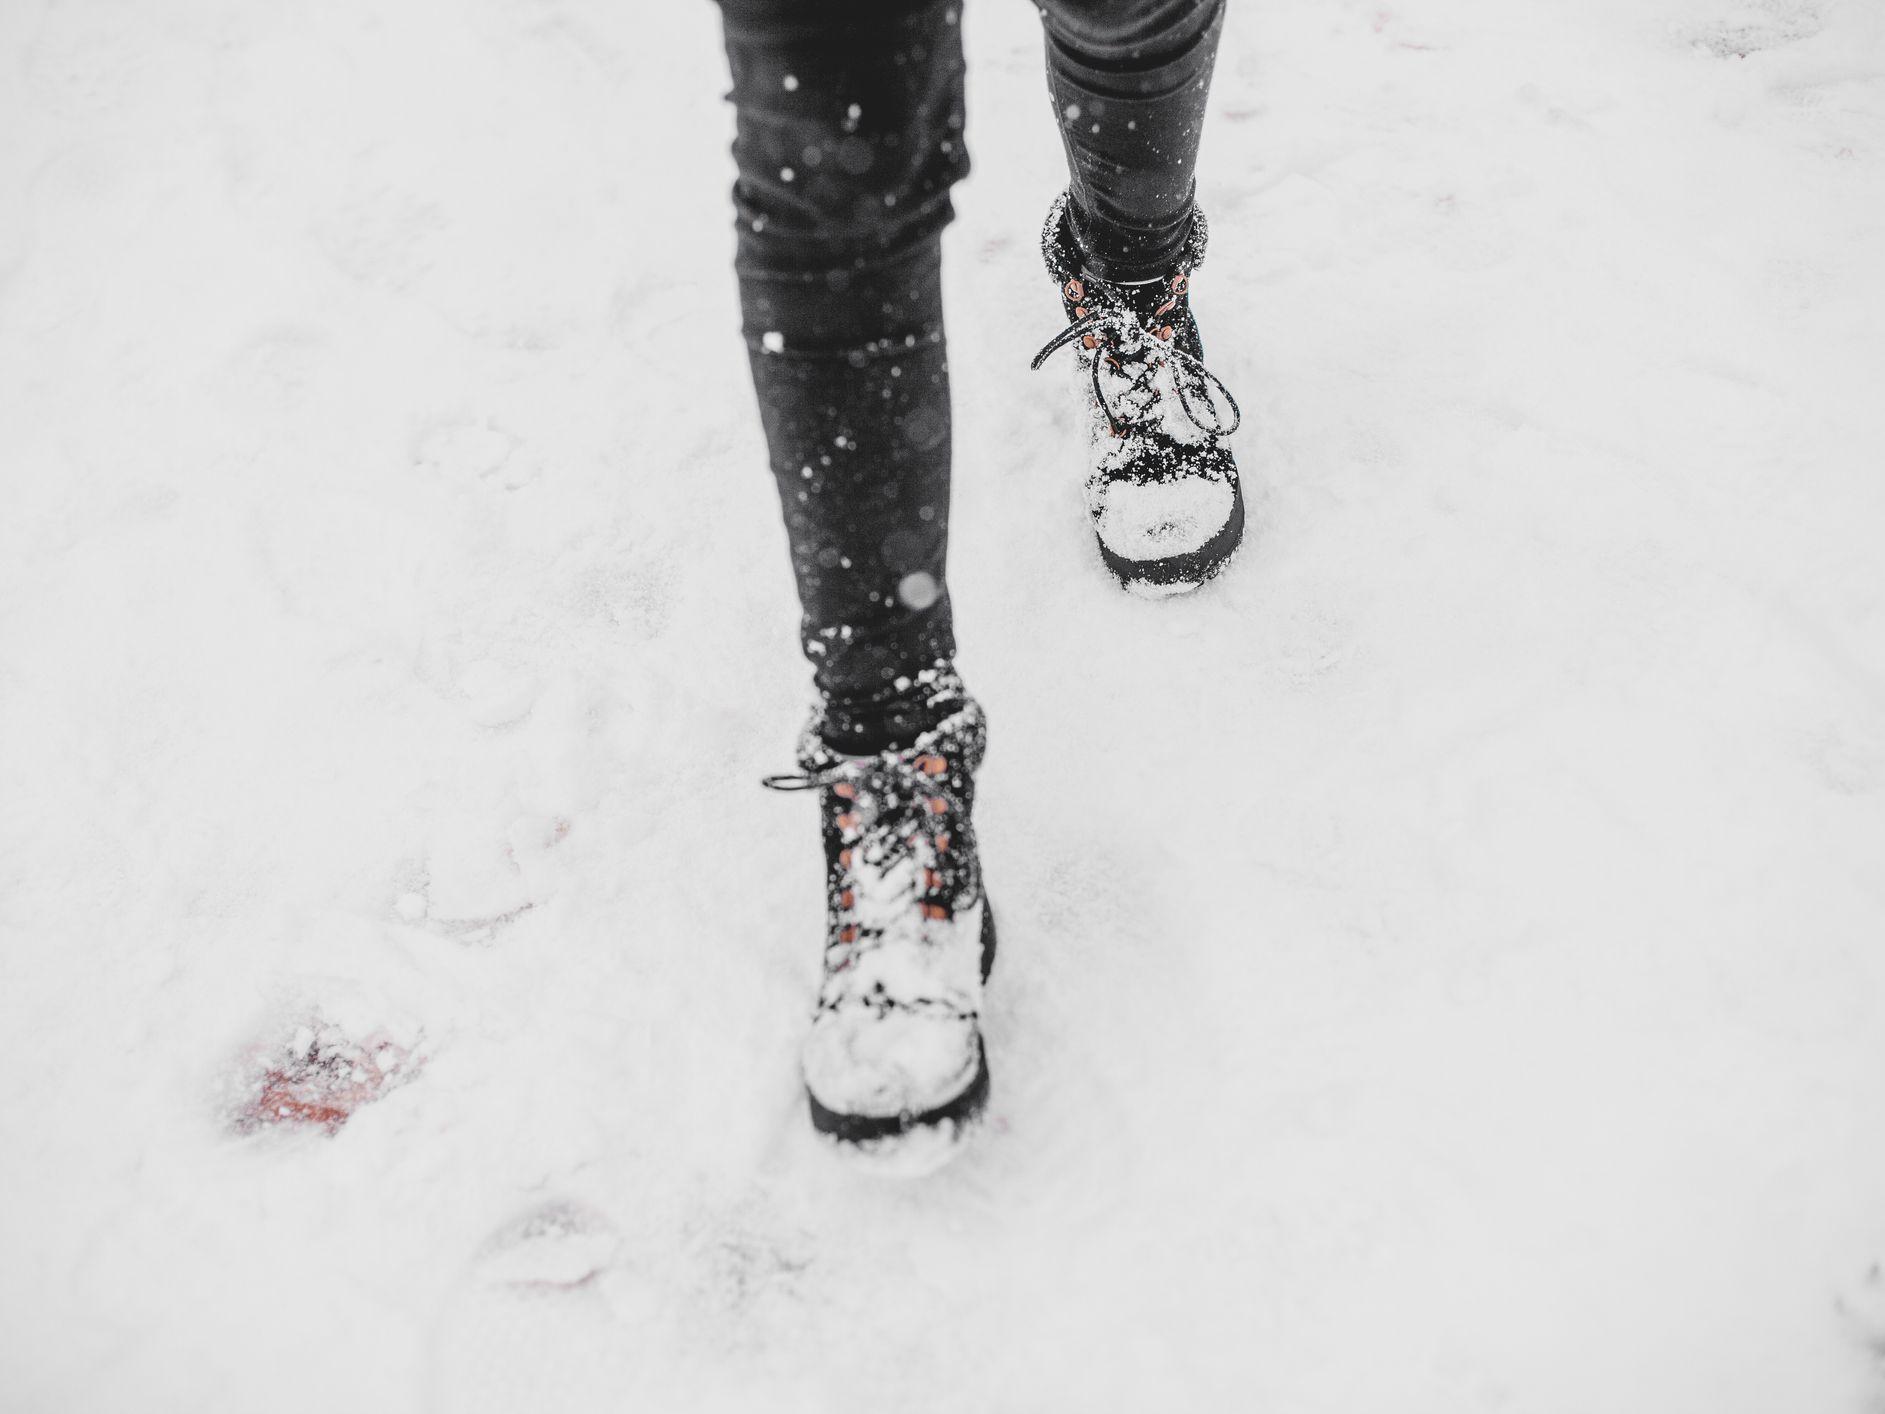 88abdad318f The Best Women's Winter Boots of 2019